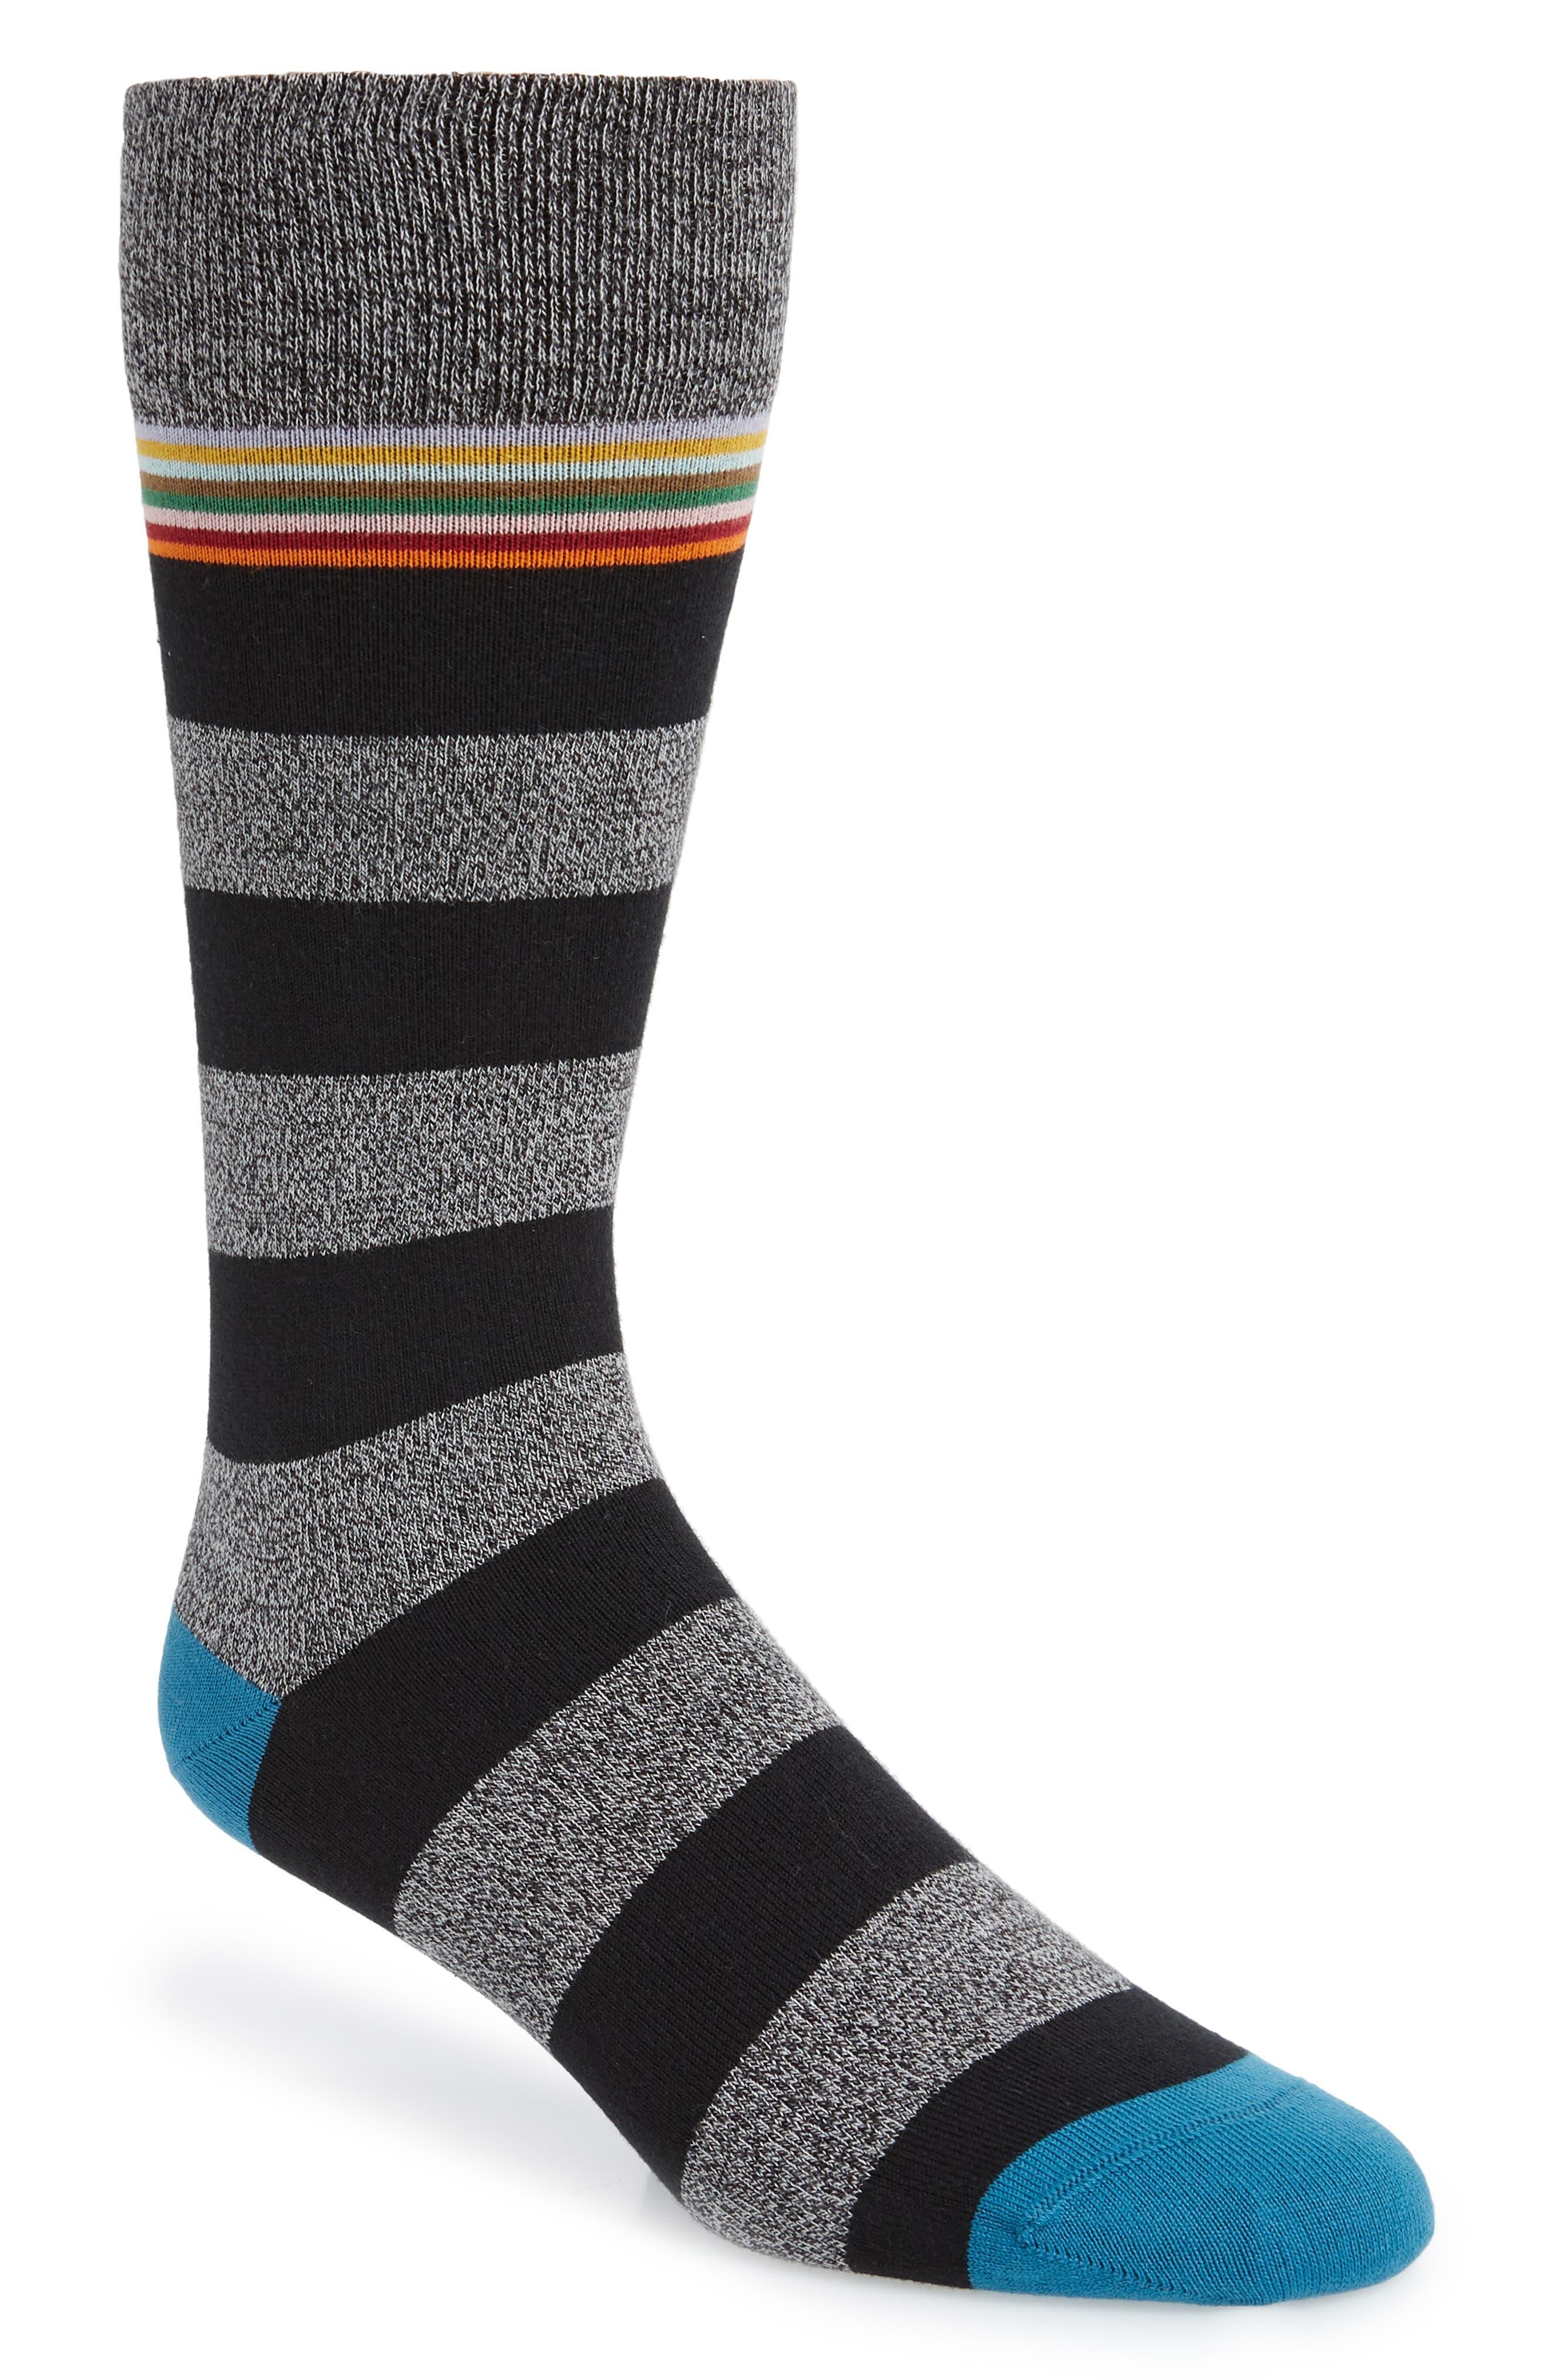 Sol Stripe Socks,                             Main thumbnail 1, color,                             BLACK/ GREY/ BLUE